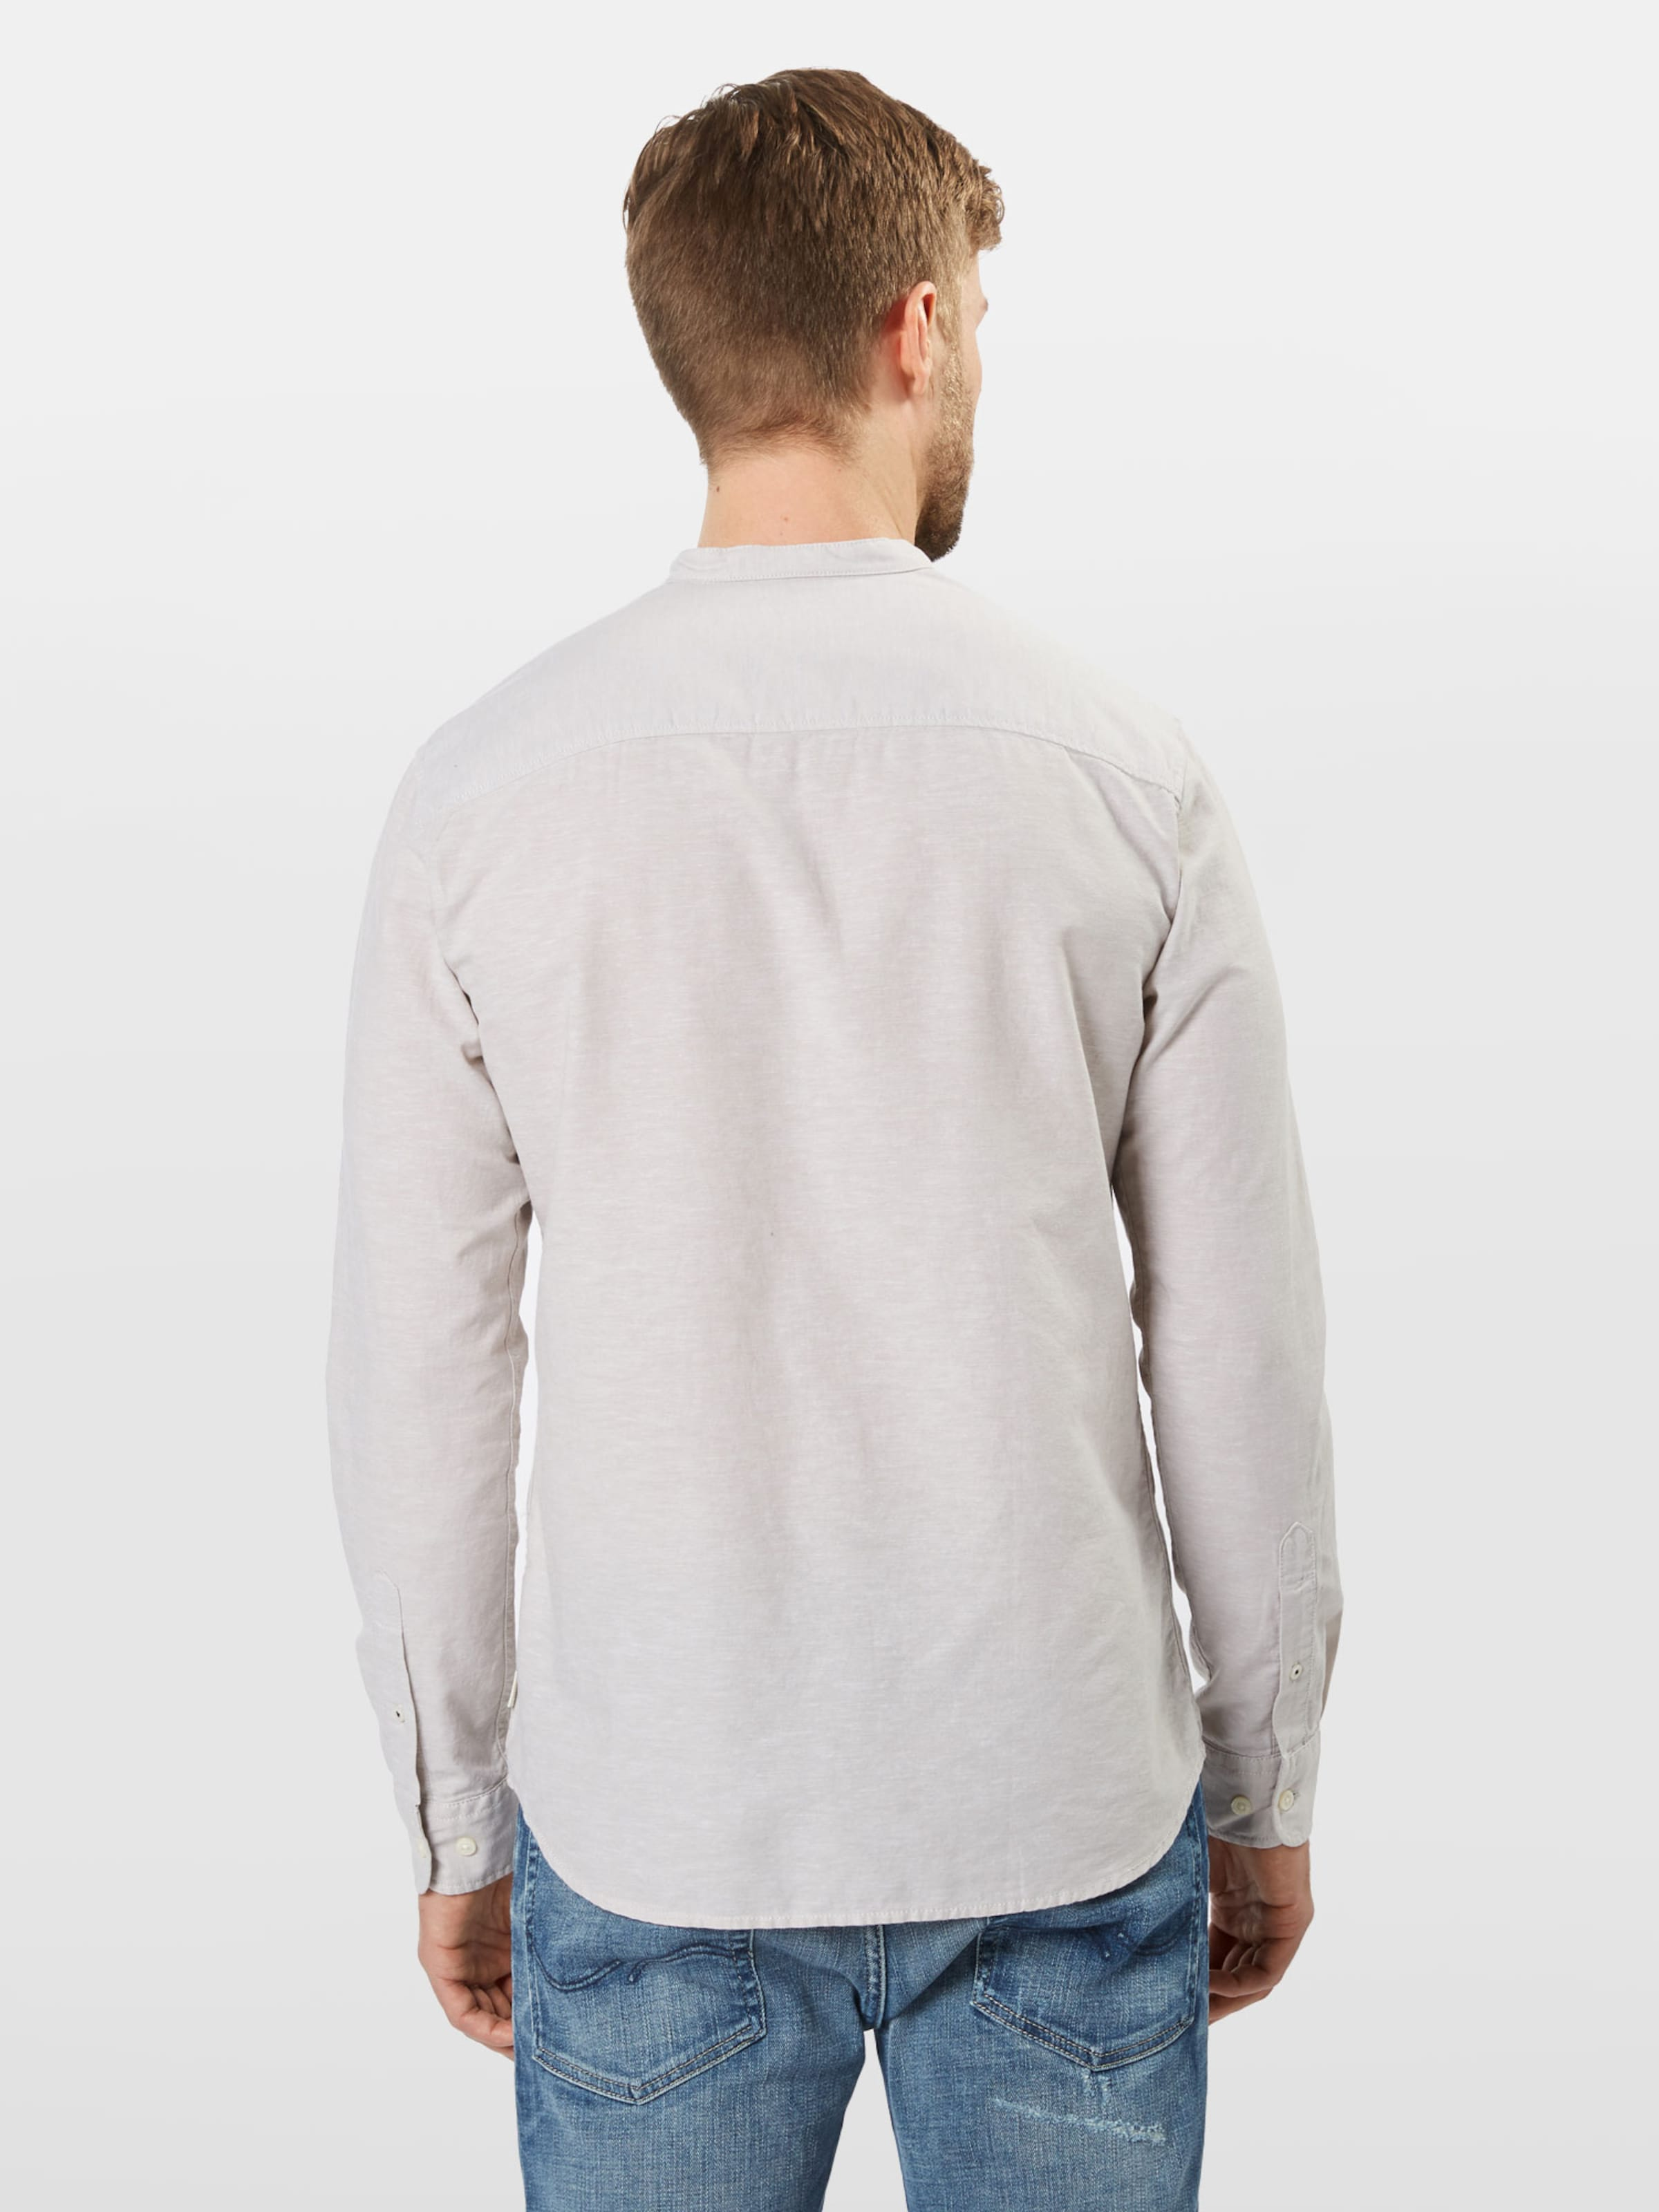 'jjesummer Shirt s L Hemd Jackamp; Band Noos' In Jones Offwhite eEYH2IDbW9